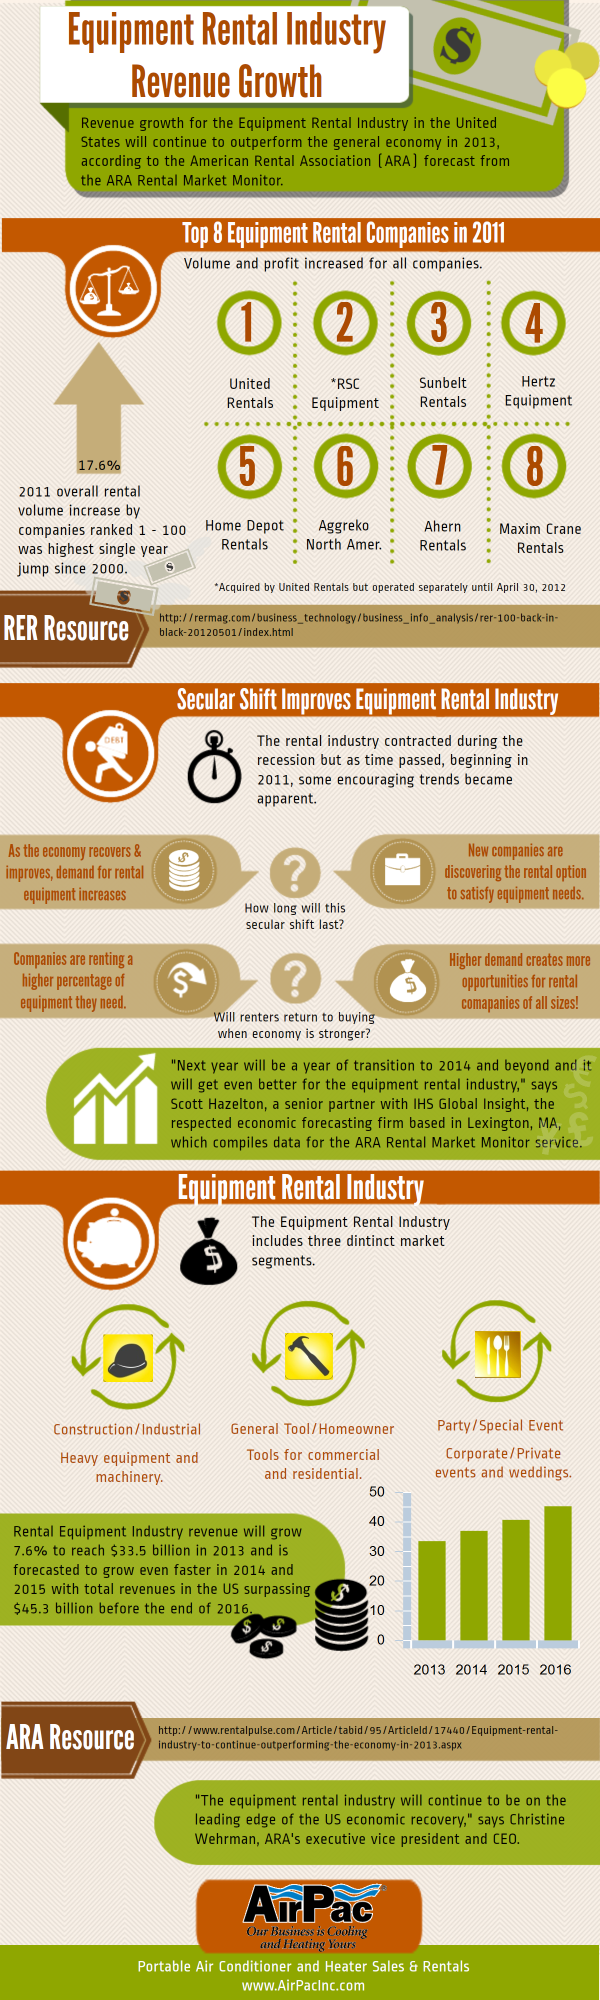 Equipment-Rental-Industry-Spot-Cooler-Rental-Revenue-Growth